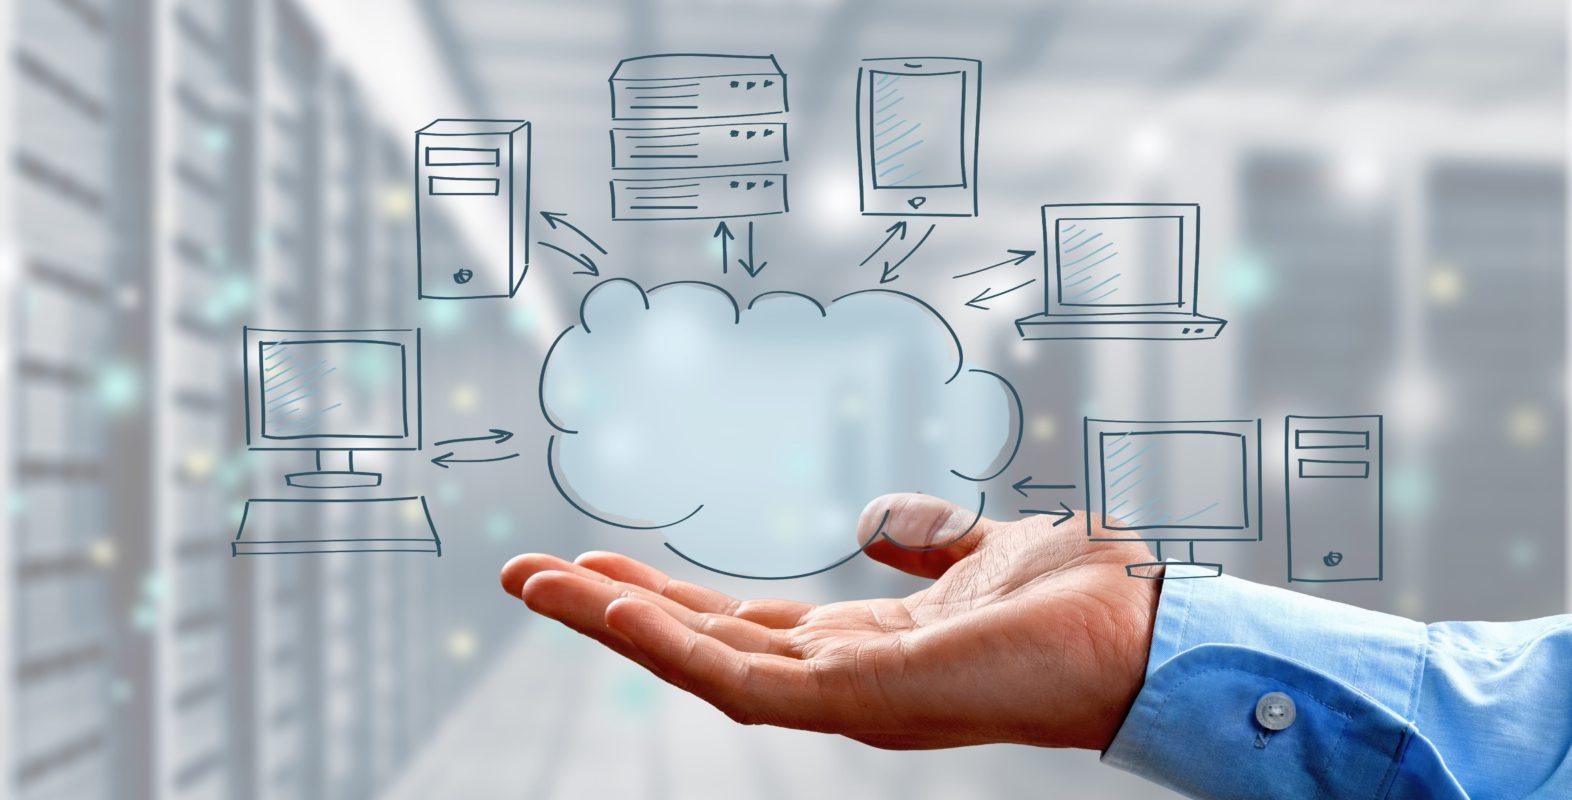 Modernste Cloud-Technik